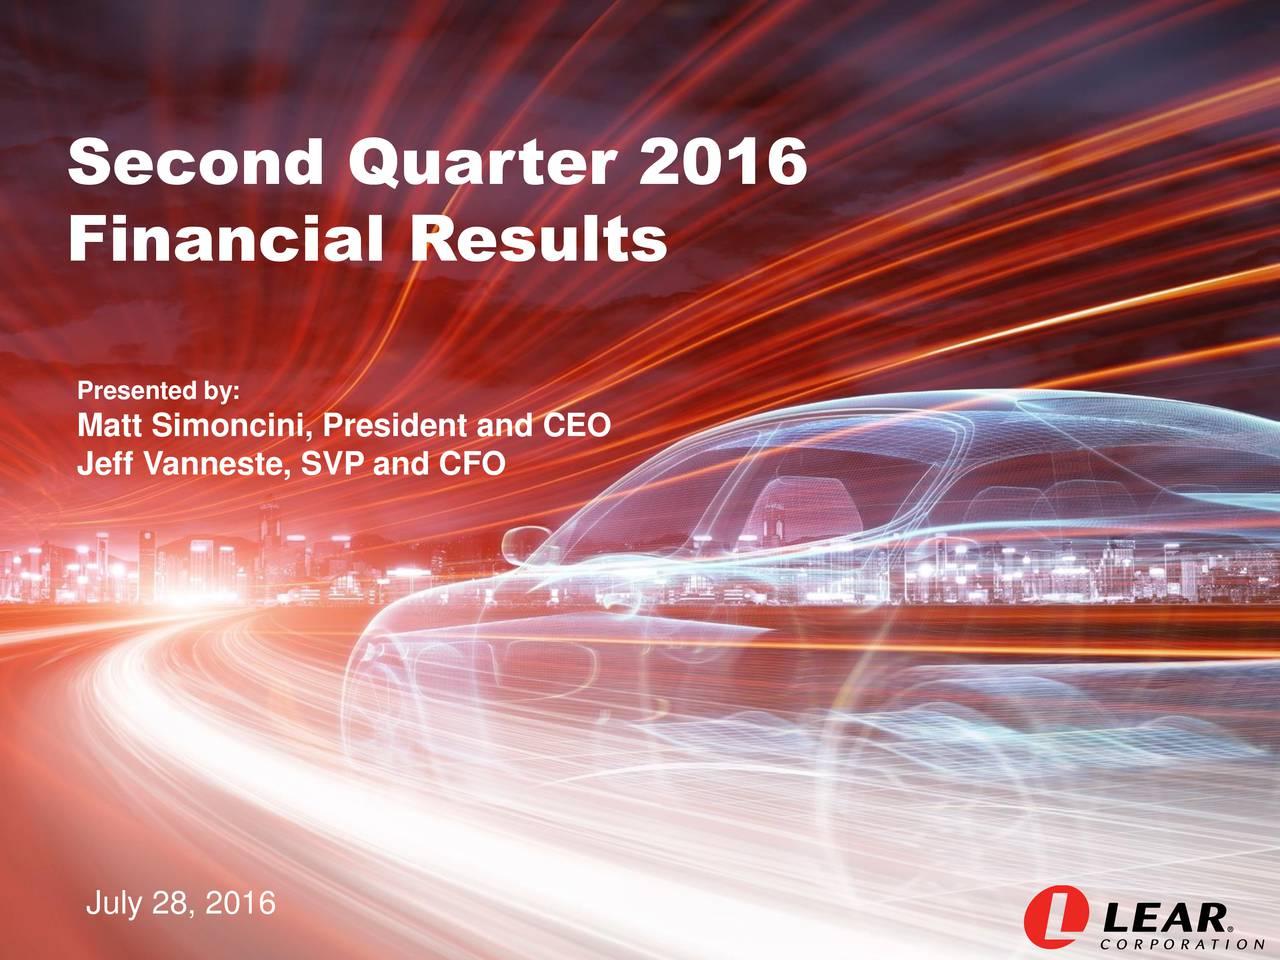 Financial Results Matt Simoncini, President and CEO Jeff Vanneste, SVP and CFO July 28, 2016